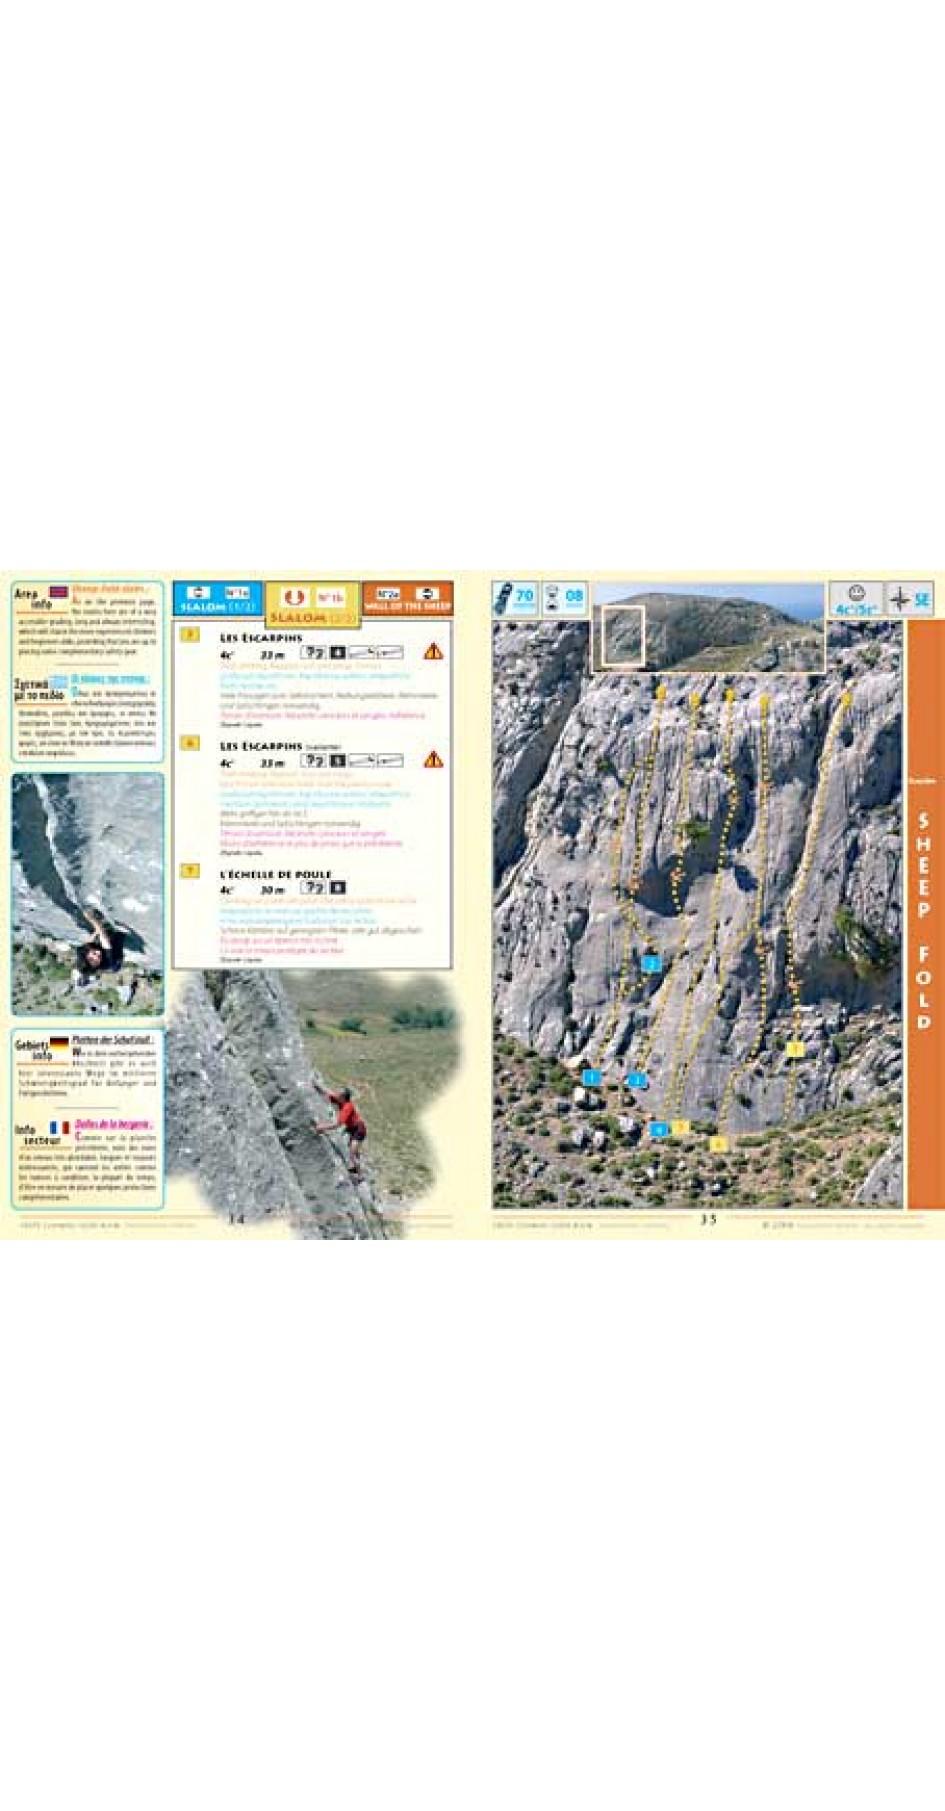 Crete (Kapetaniana/Kofinas) Climbing guide